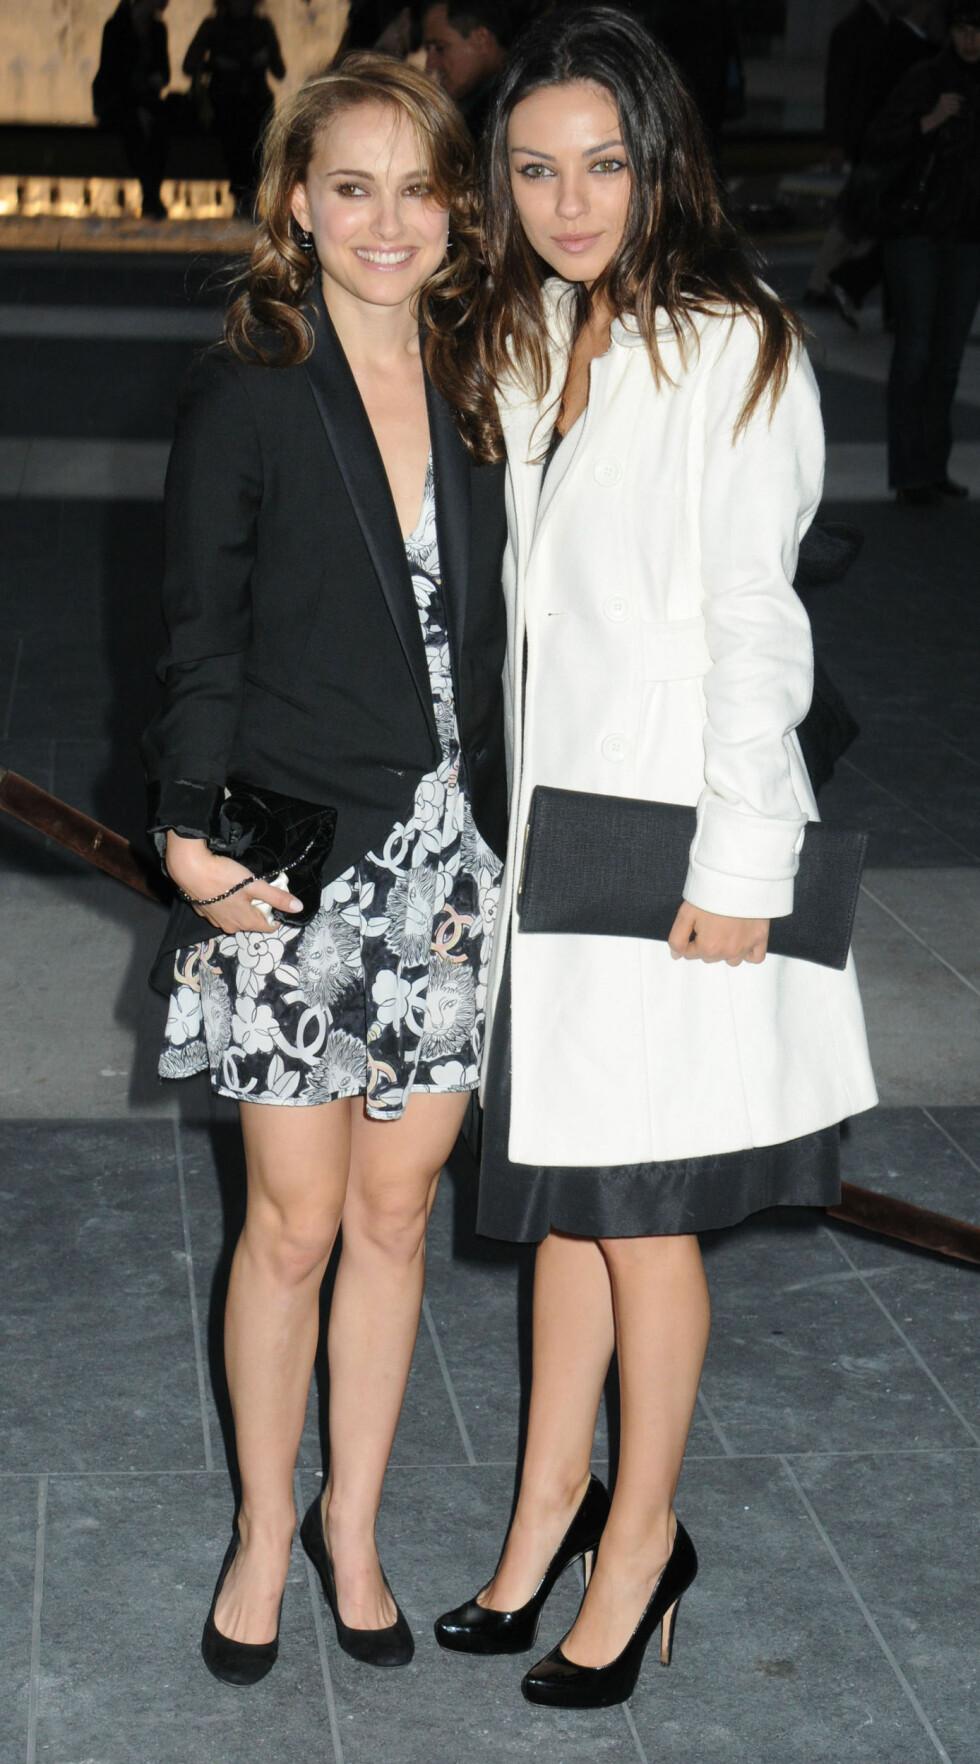 GODE VENNER: Portman og Kunis er gode venner, og spilte sammen i 2010-filmen Black Swan. Foto: All Over Press